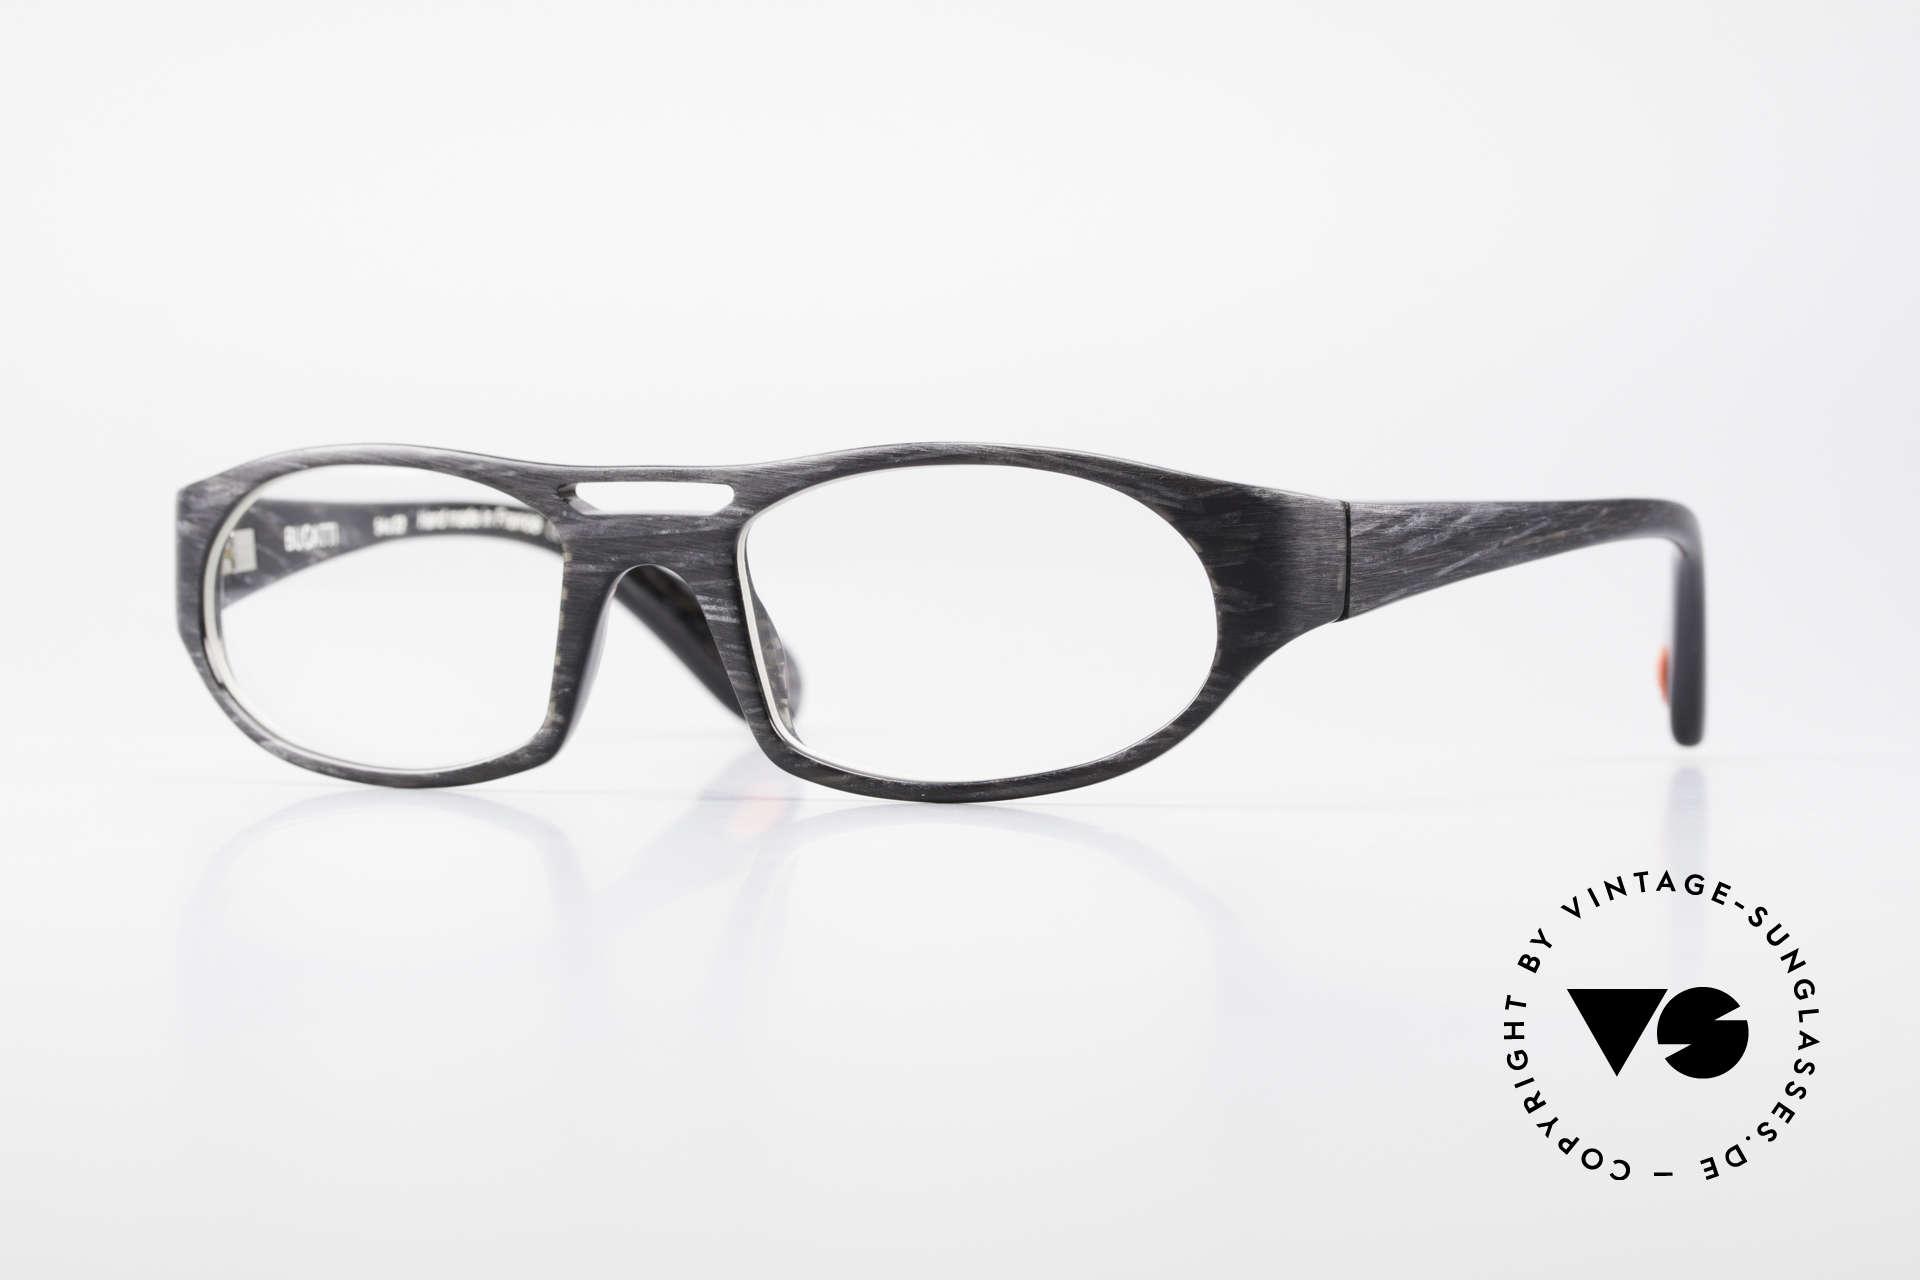 Bugatti 220 XLarge Designer Luxury Frame, striking high-tech eyeglass-frame by BUGATTI, Made for Men